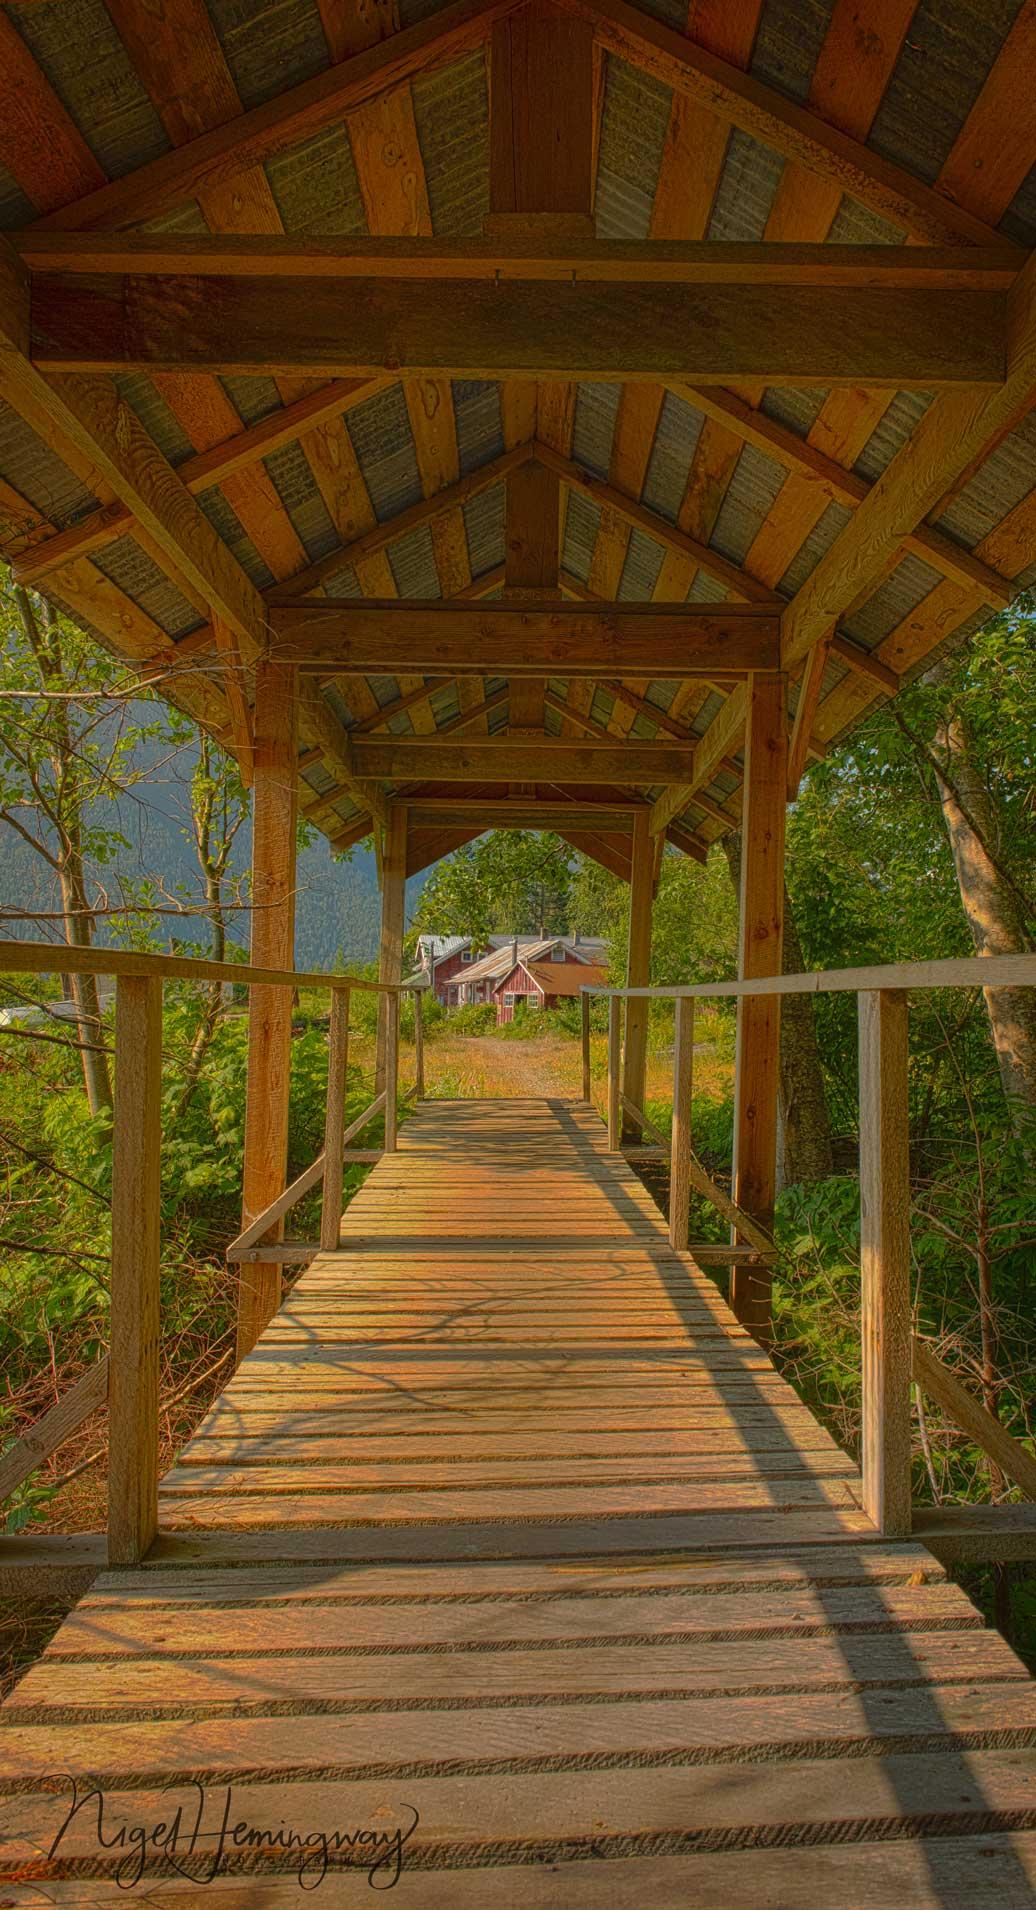 HDR-Bridge-to-Tallheo - Nigel Hemingway